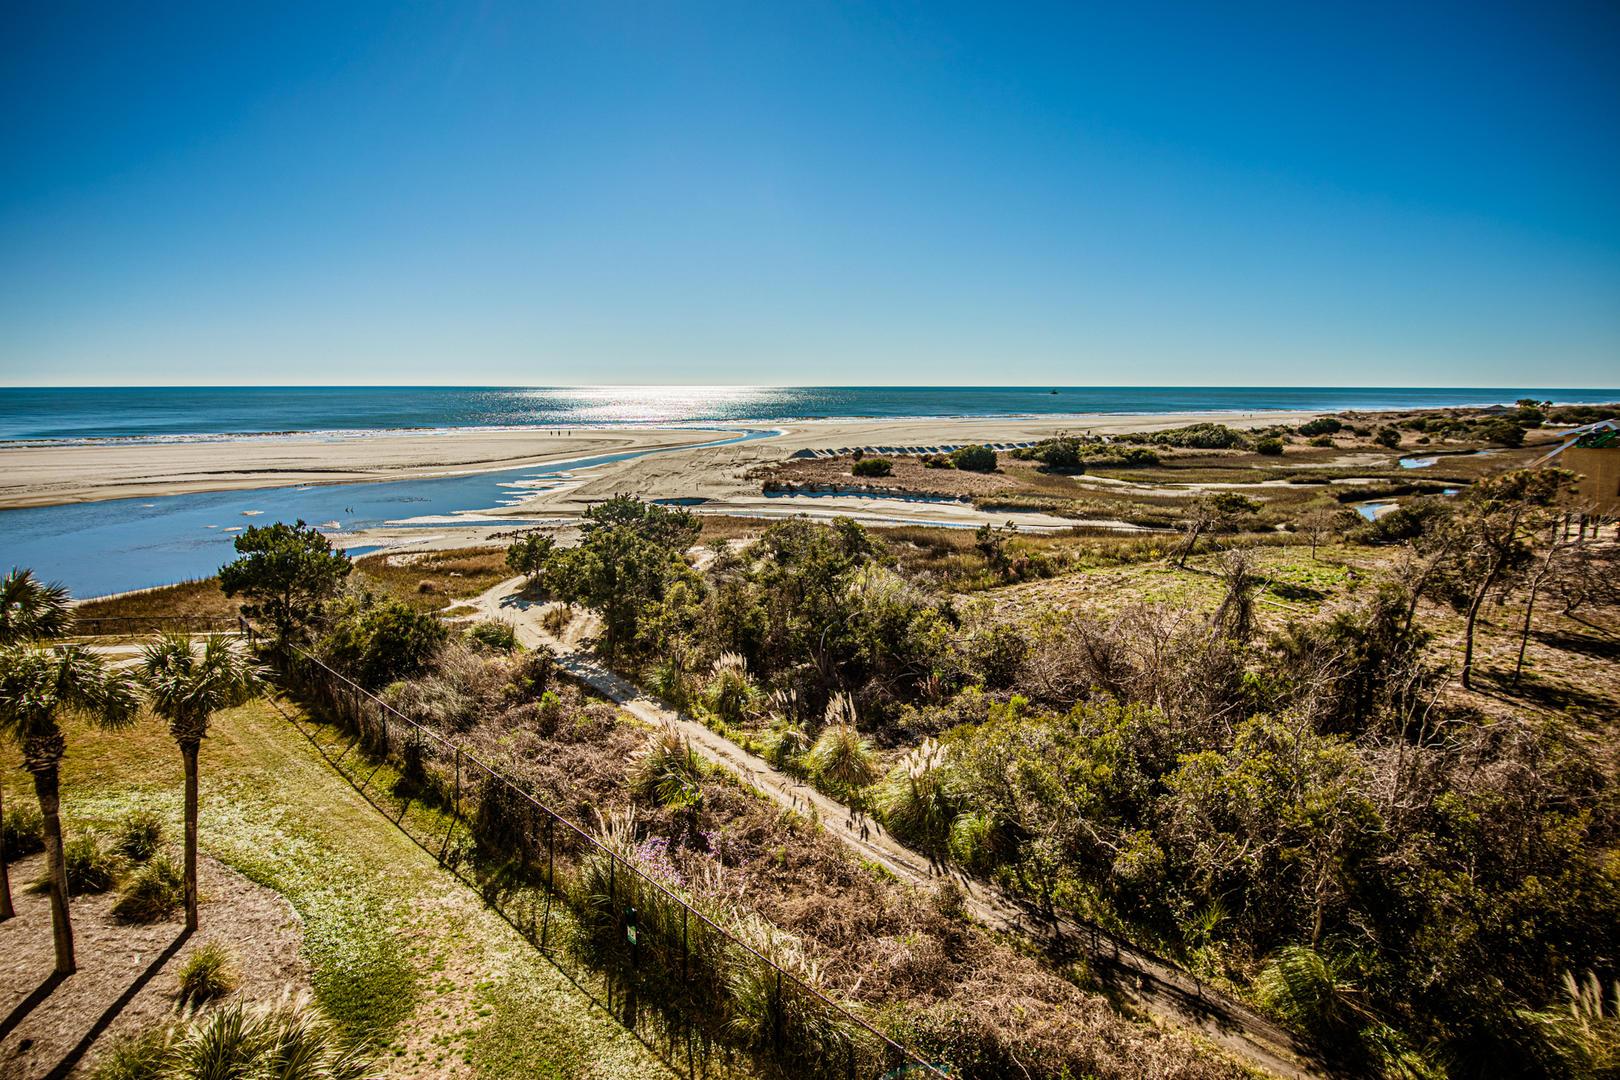 Ocean Creek PP4 - Views of the Ocean